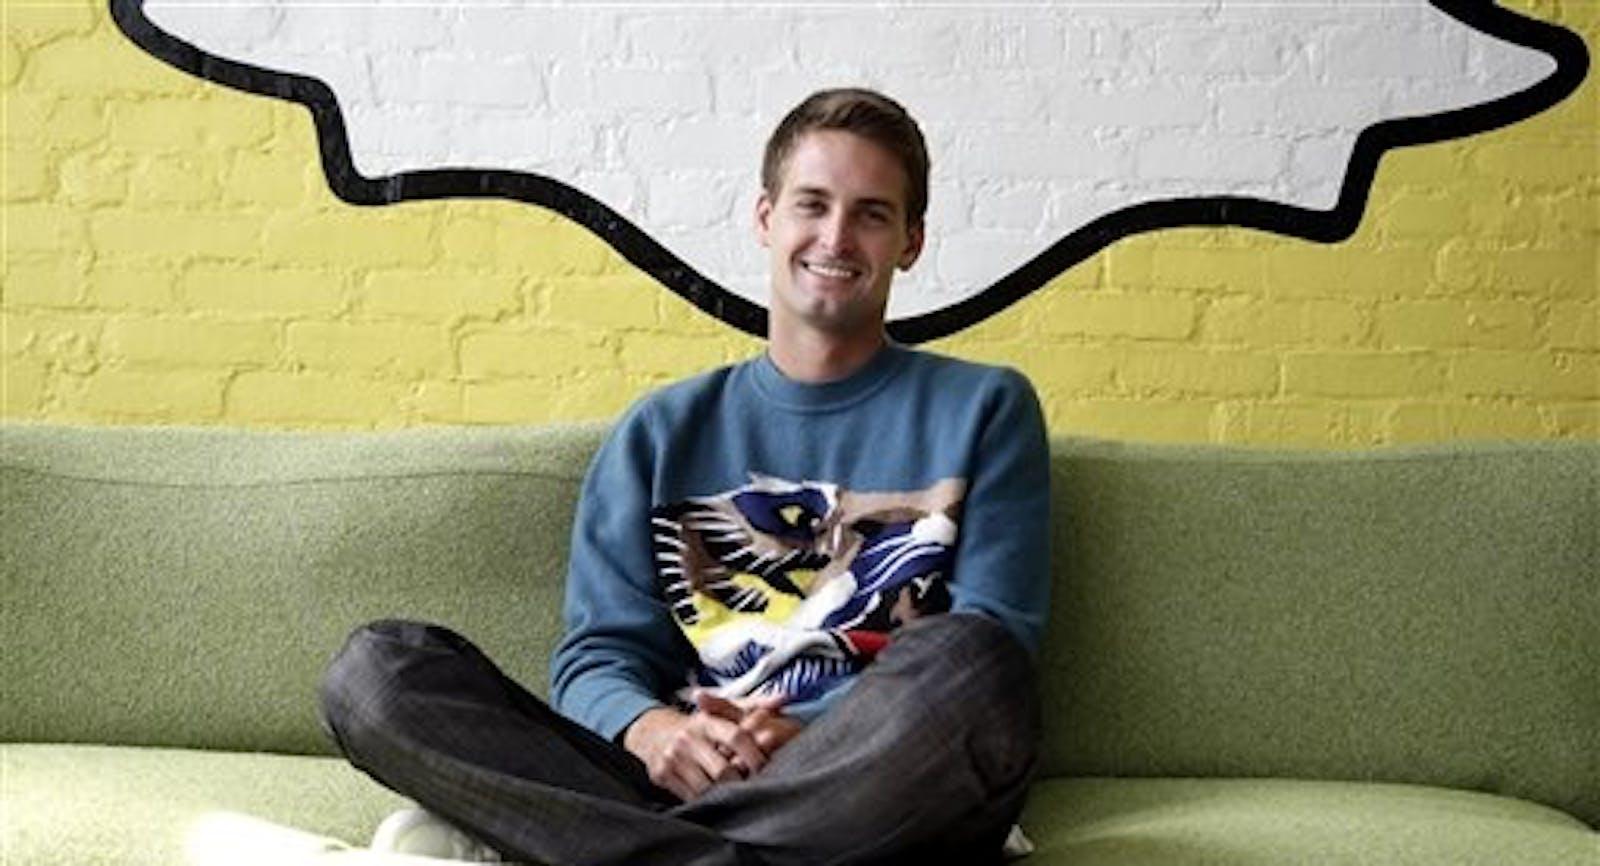 Snapchat CEO Evan Spiegel. Photo by Associated Press.